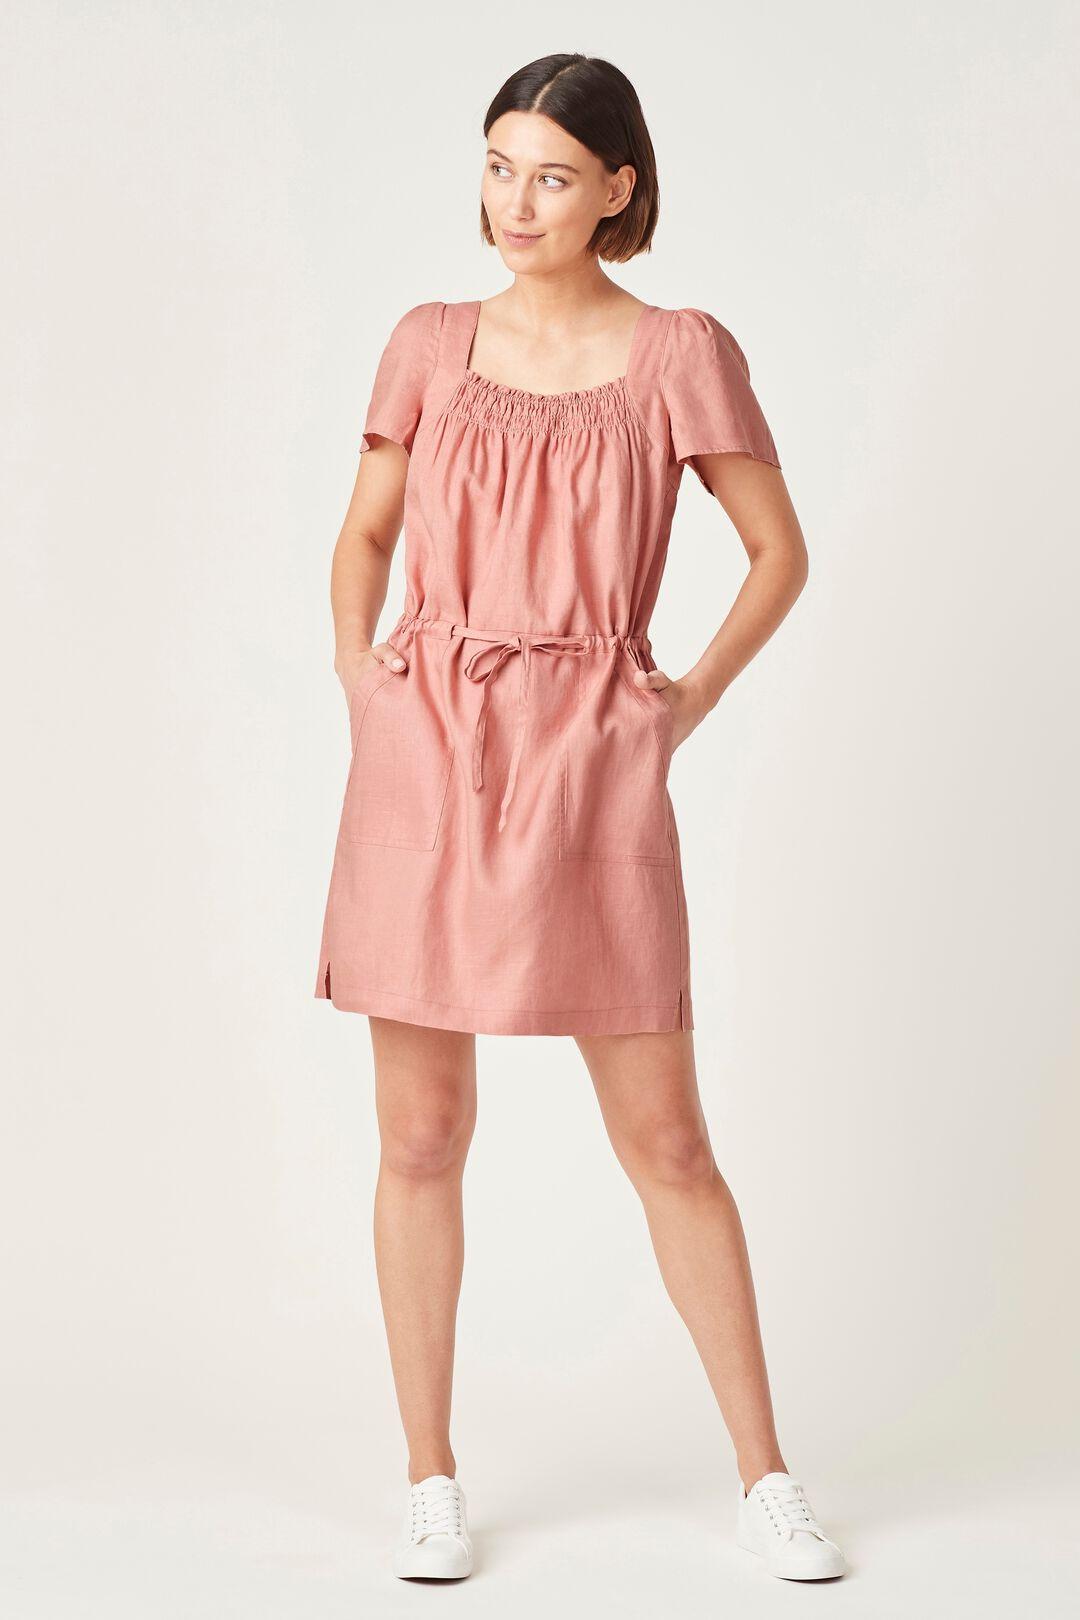 LINEN SHIRRED DRESS  DUSTY PINK  hi-res